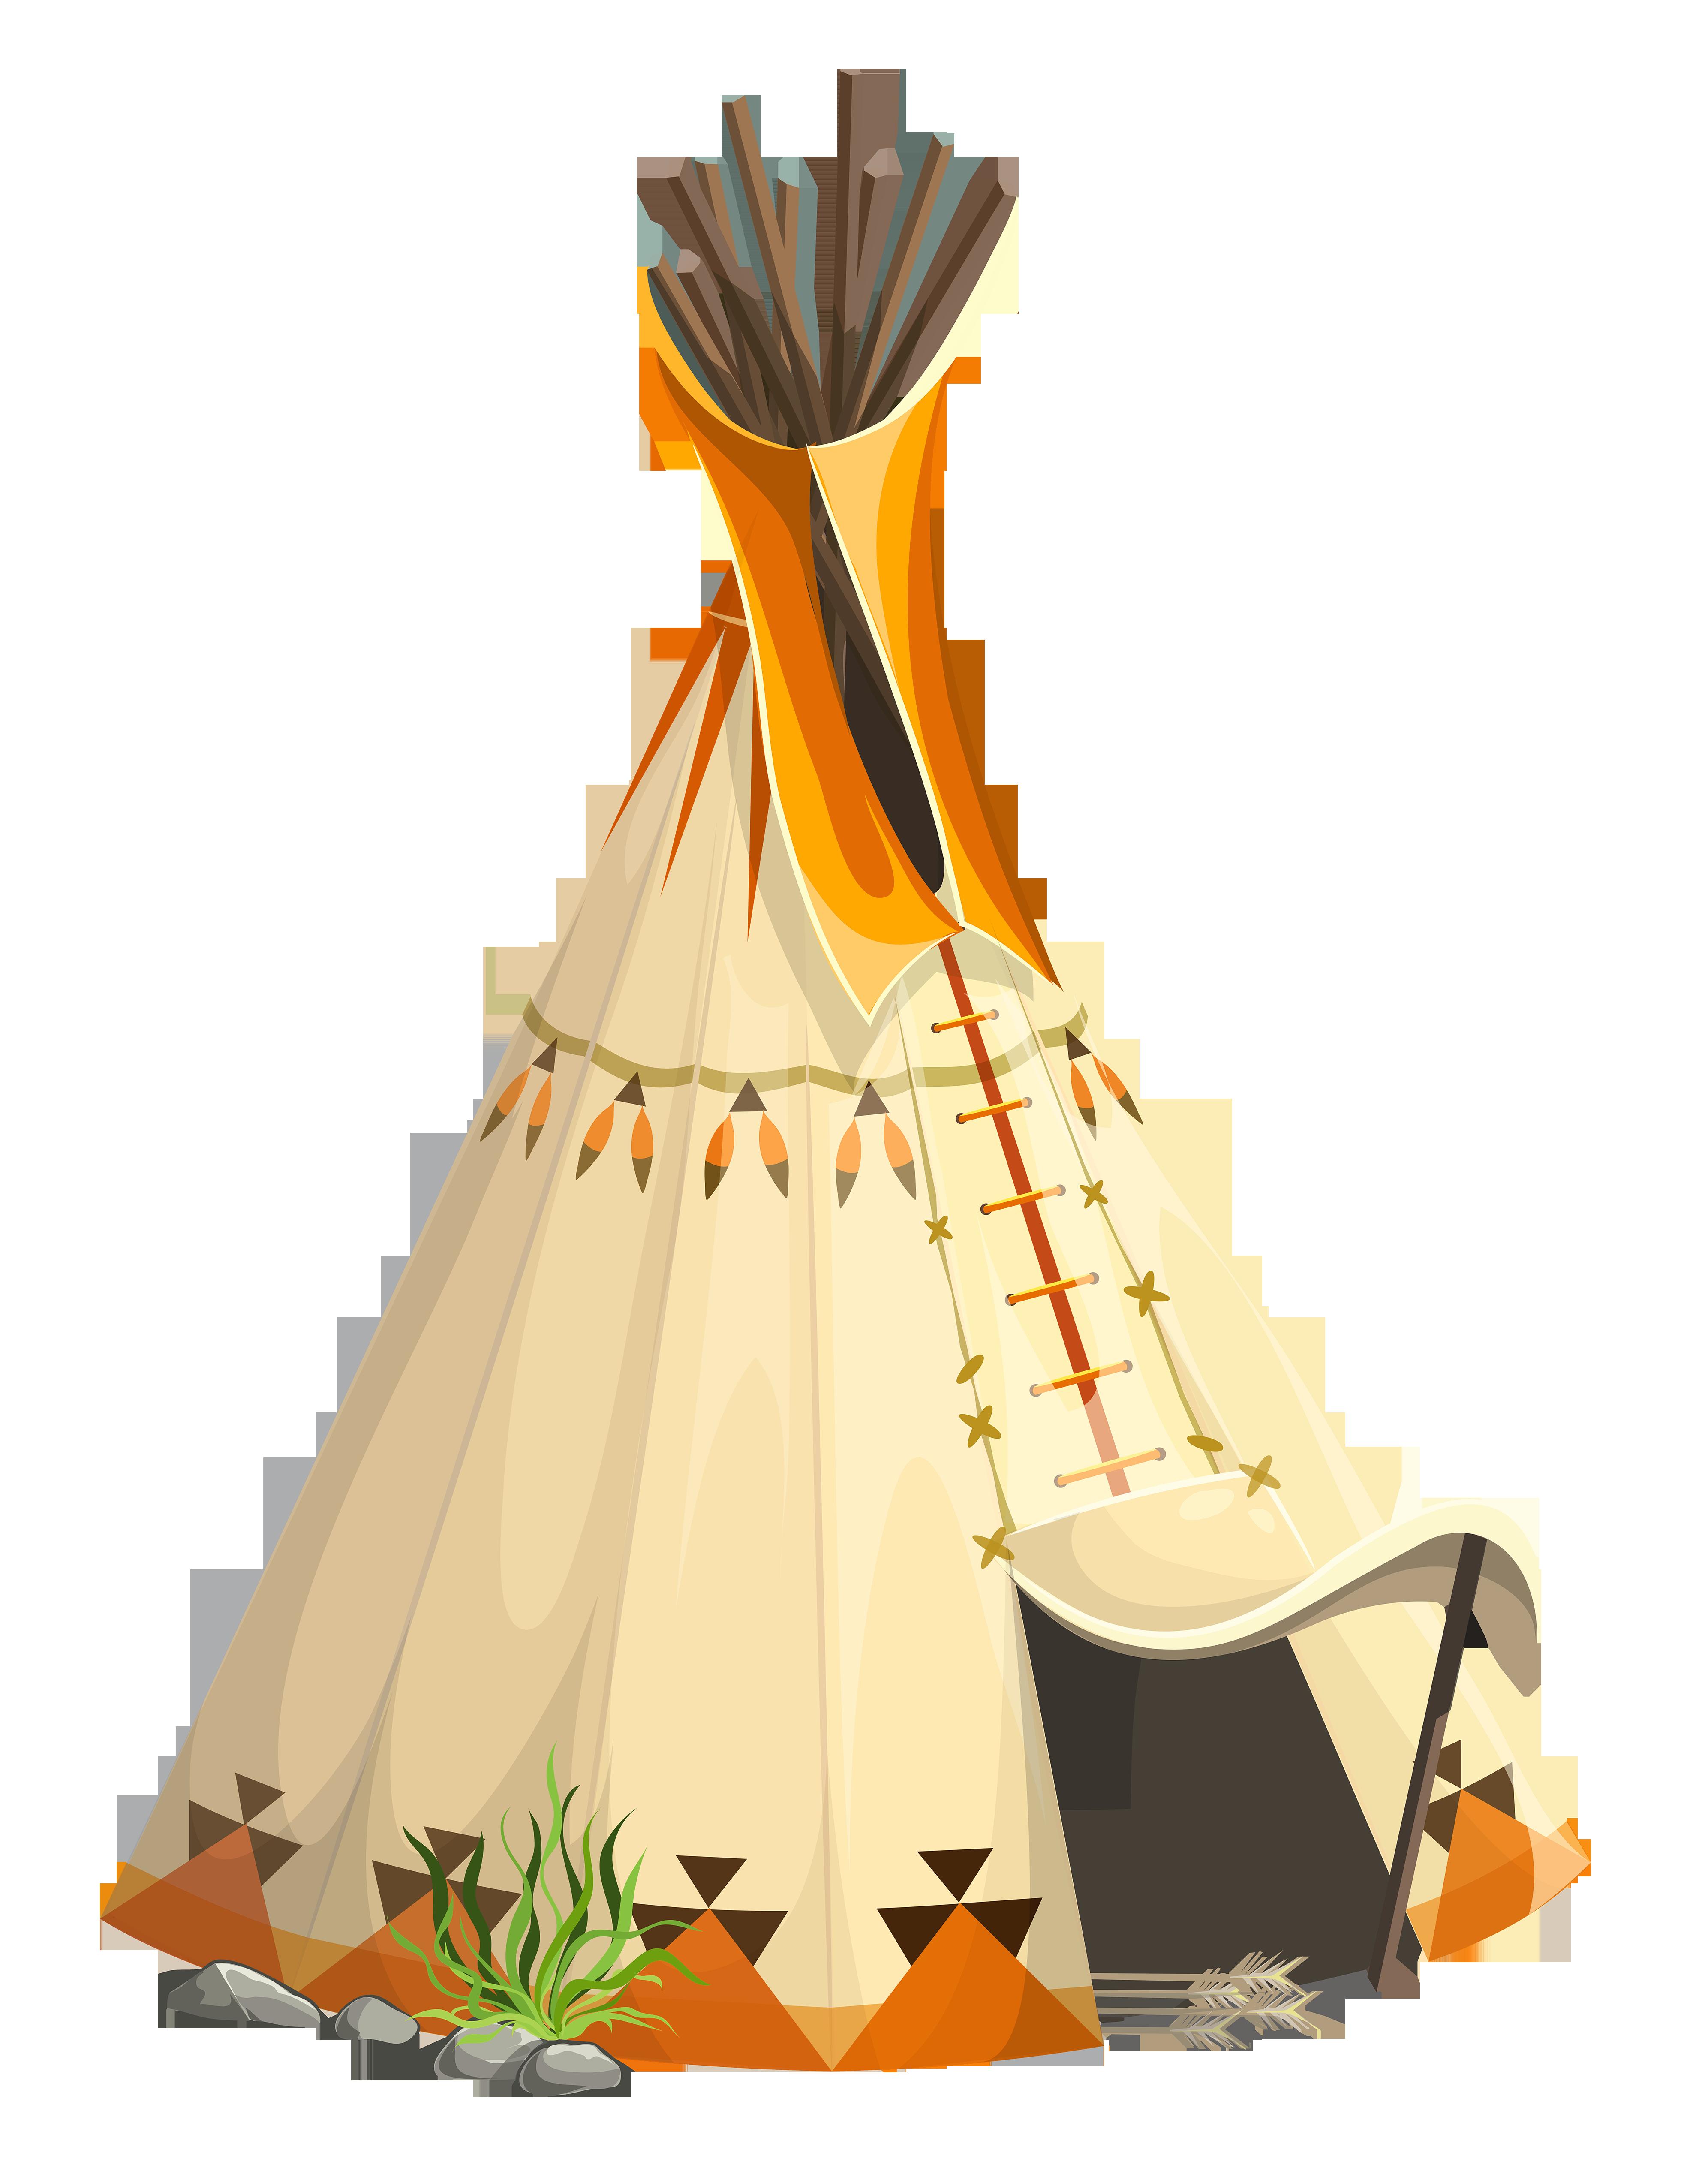 clipart tent tee pee